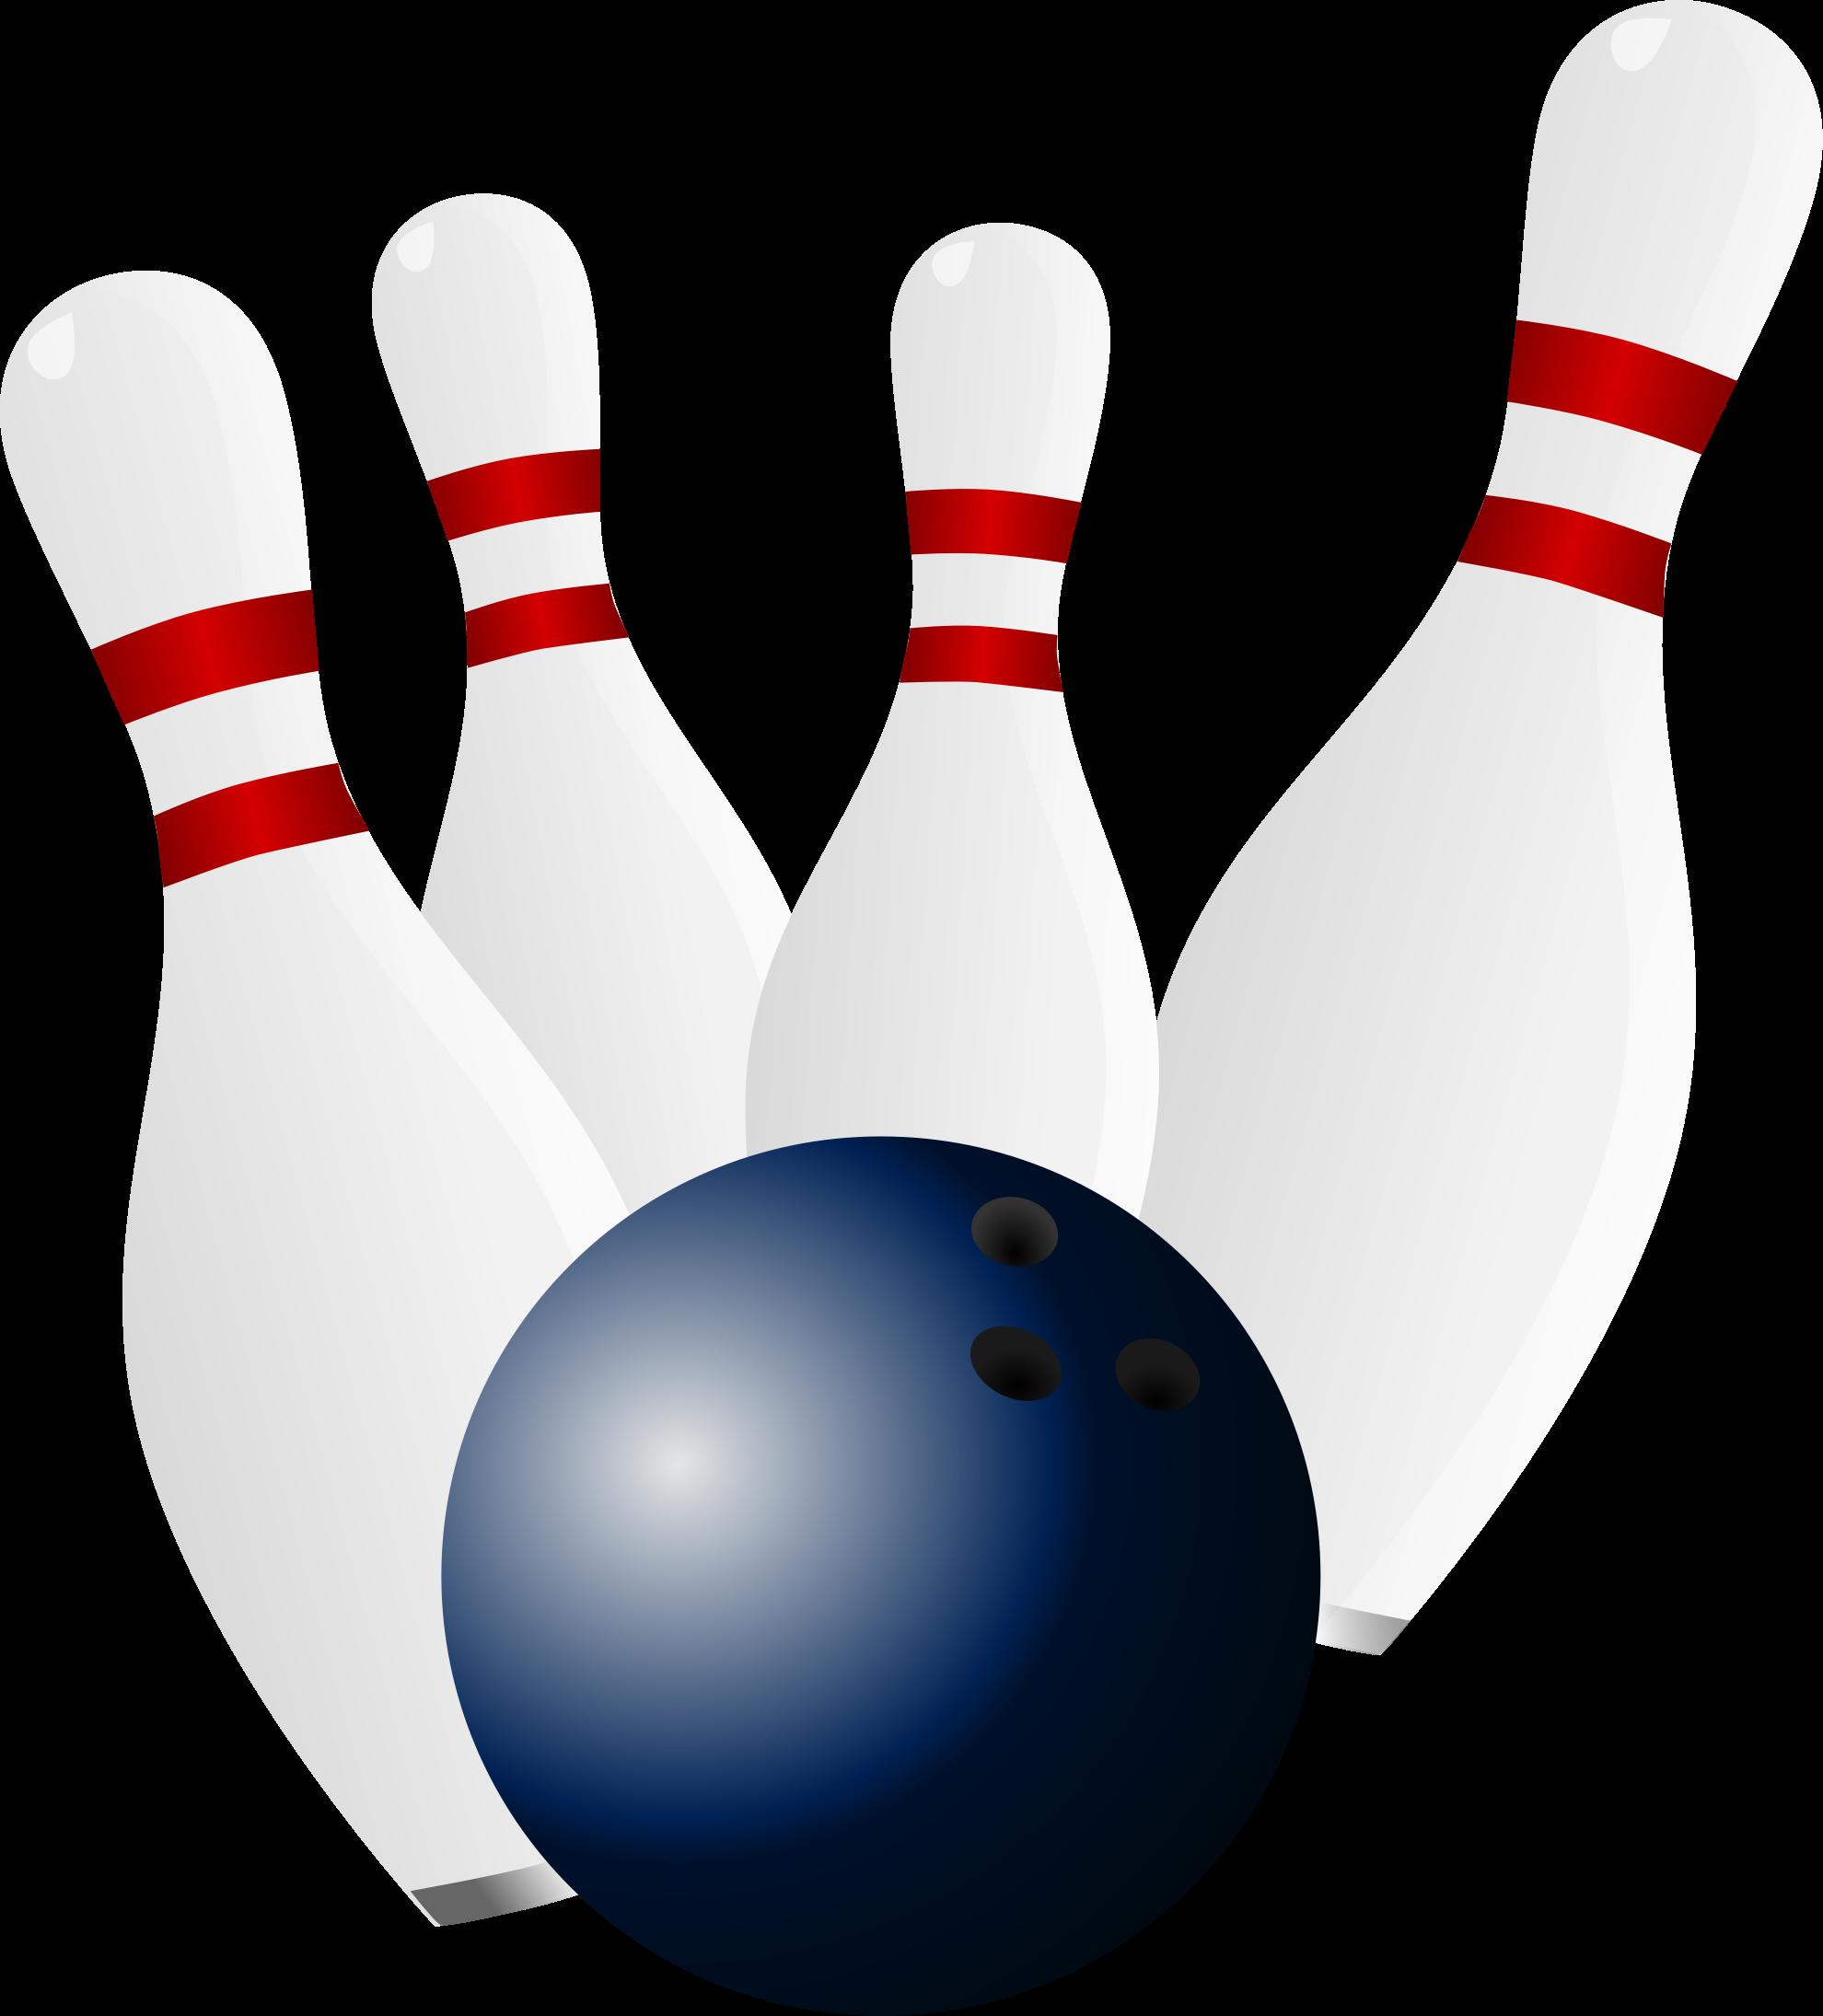 Pin clipart pumpkin bowling. Ns icons png free